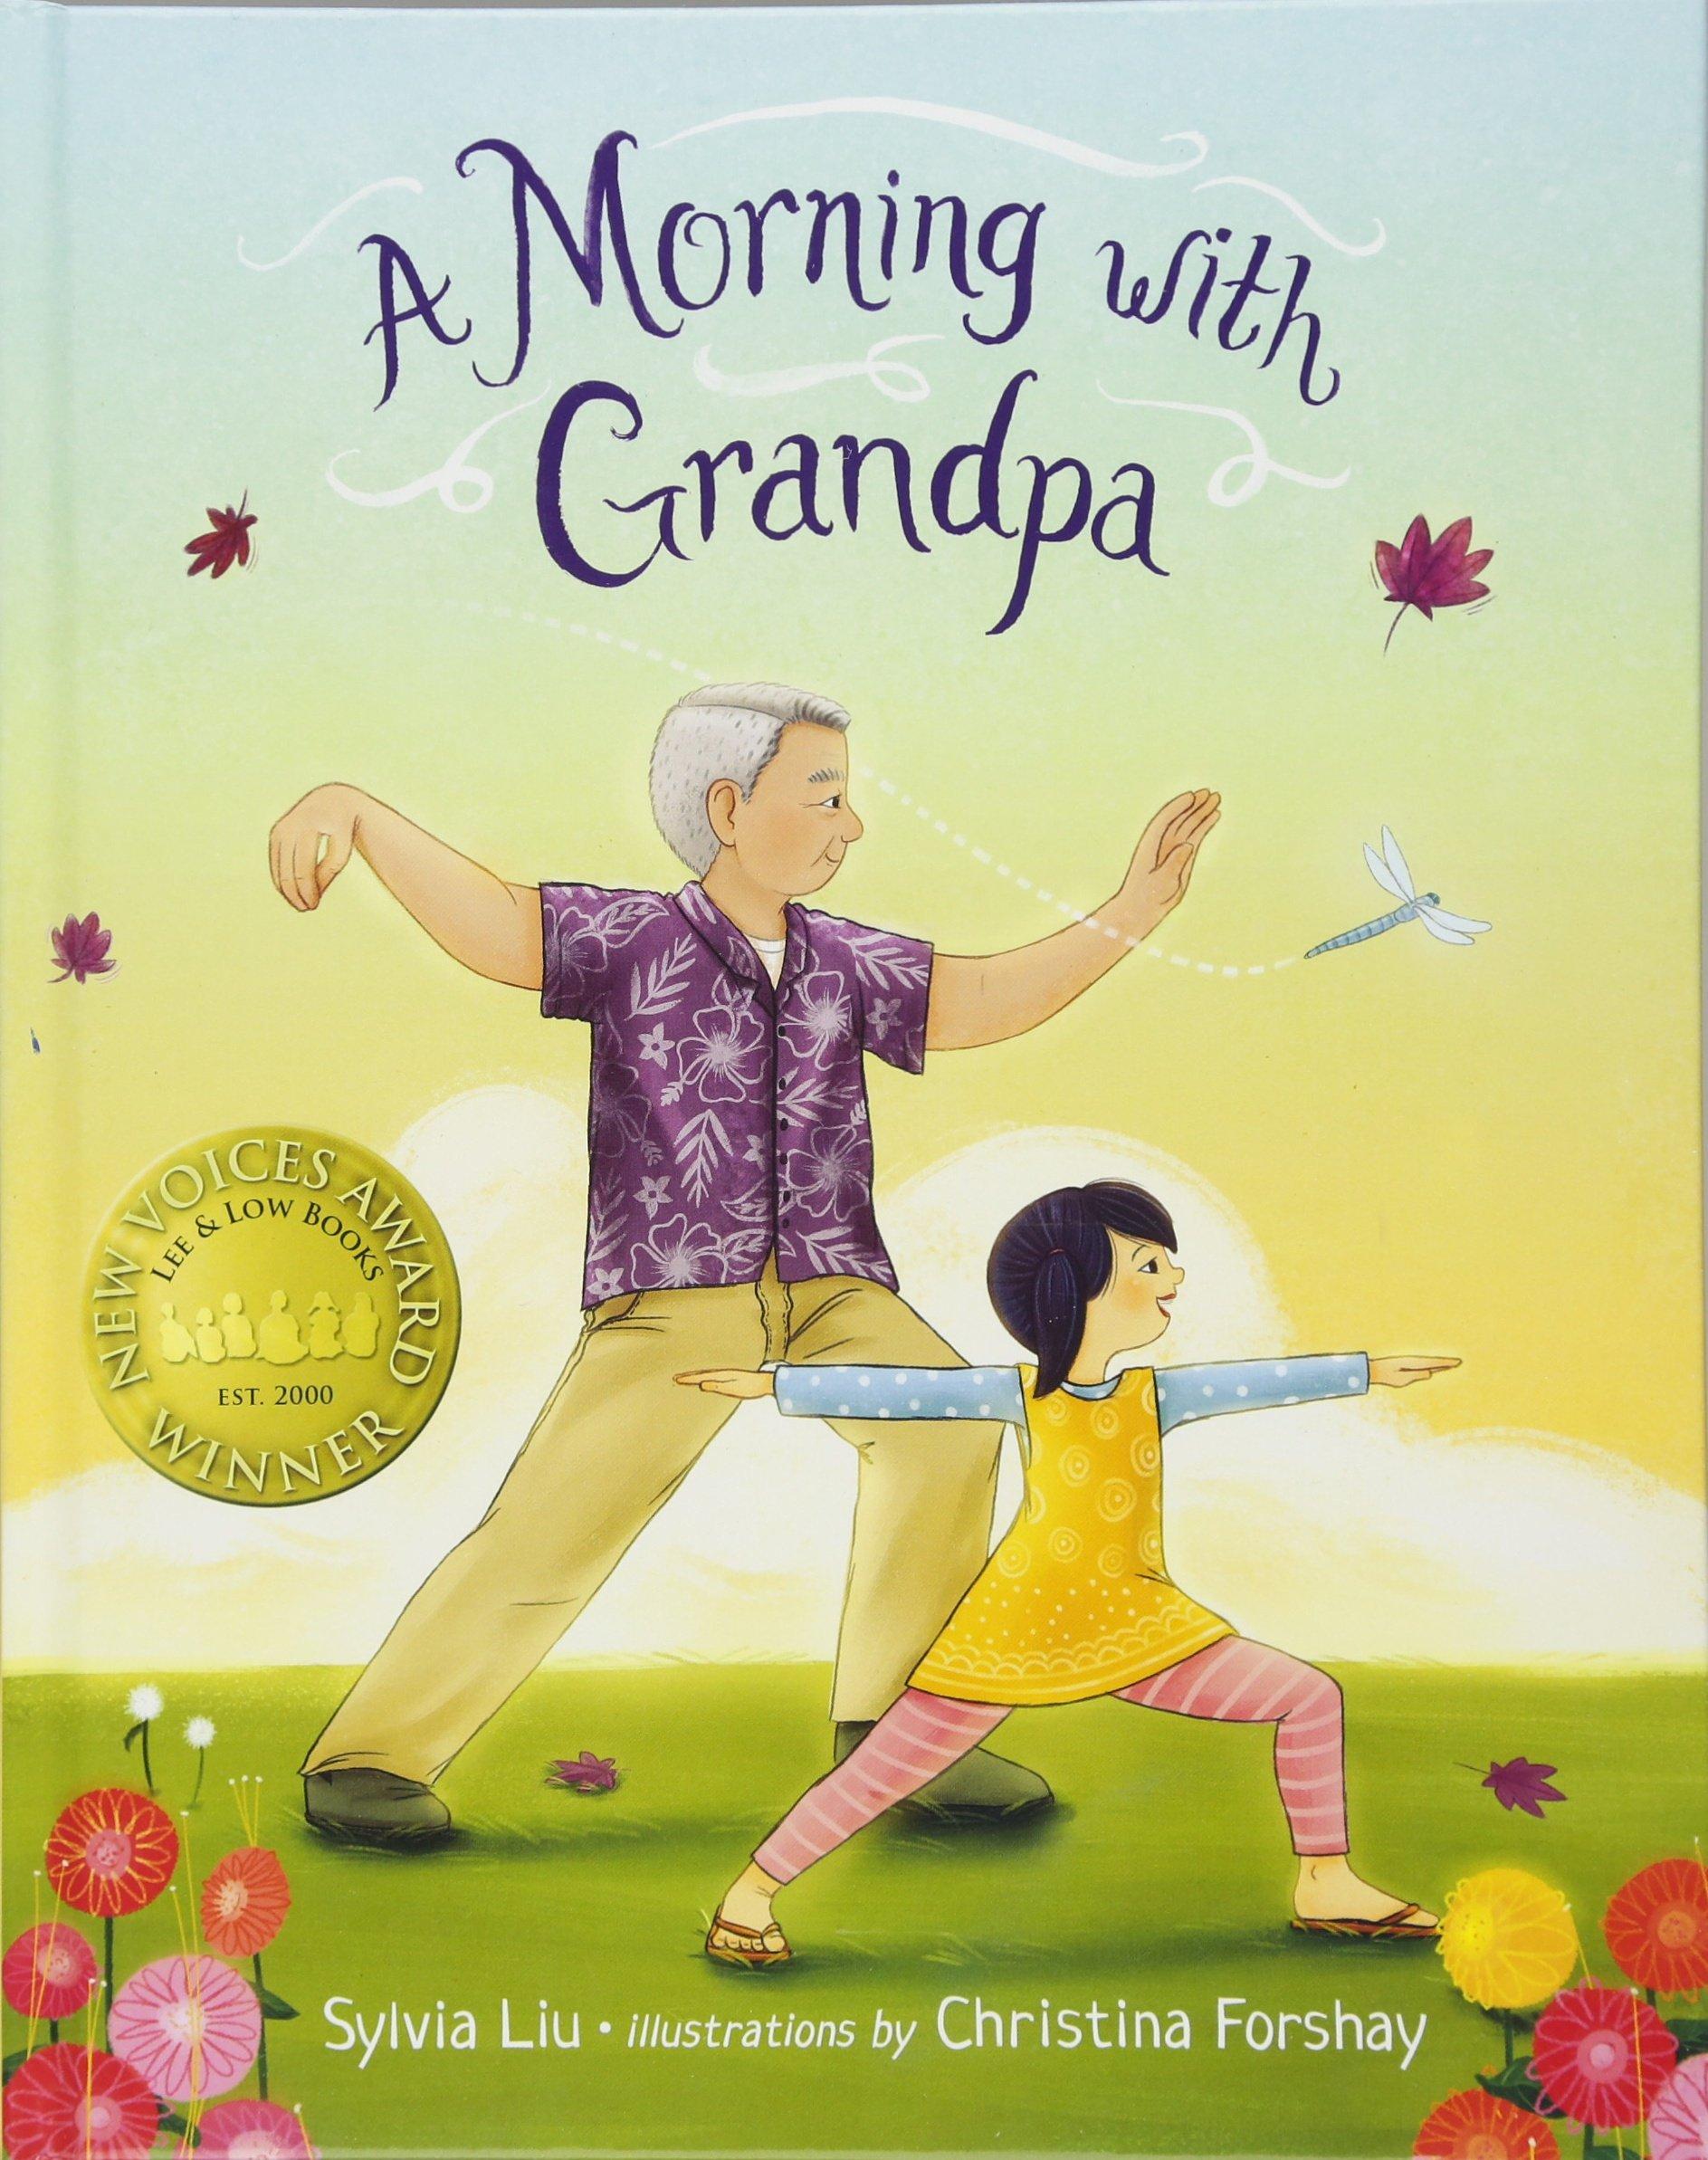 A Morning with Grandpa by Sylvia Liu